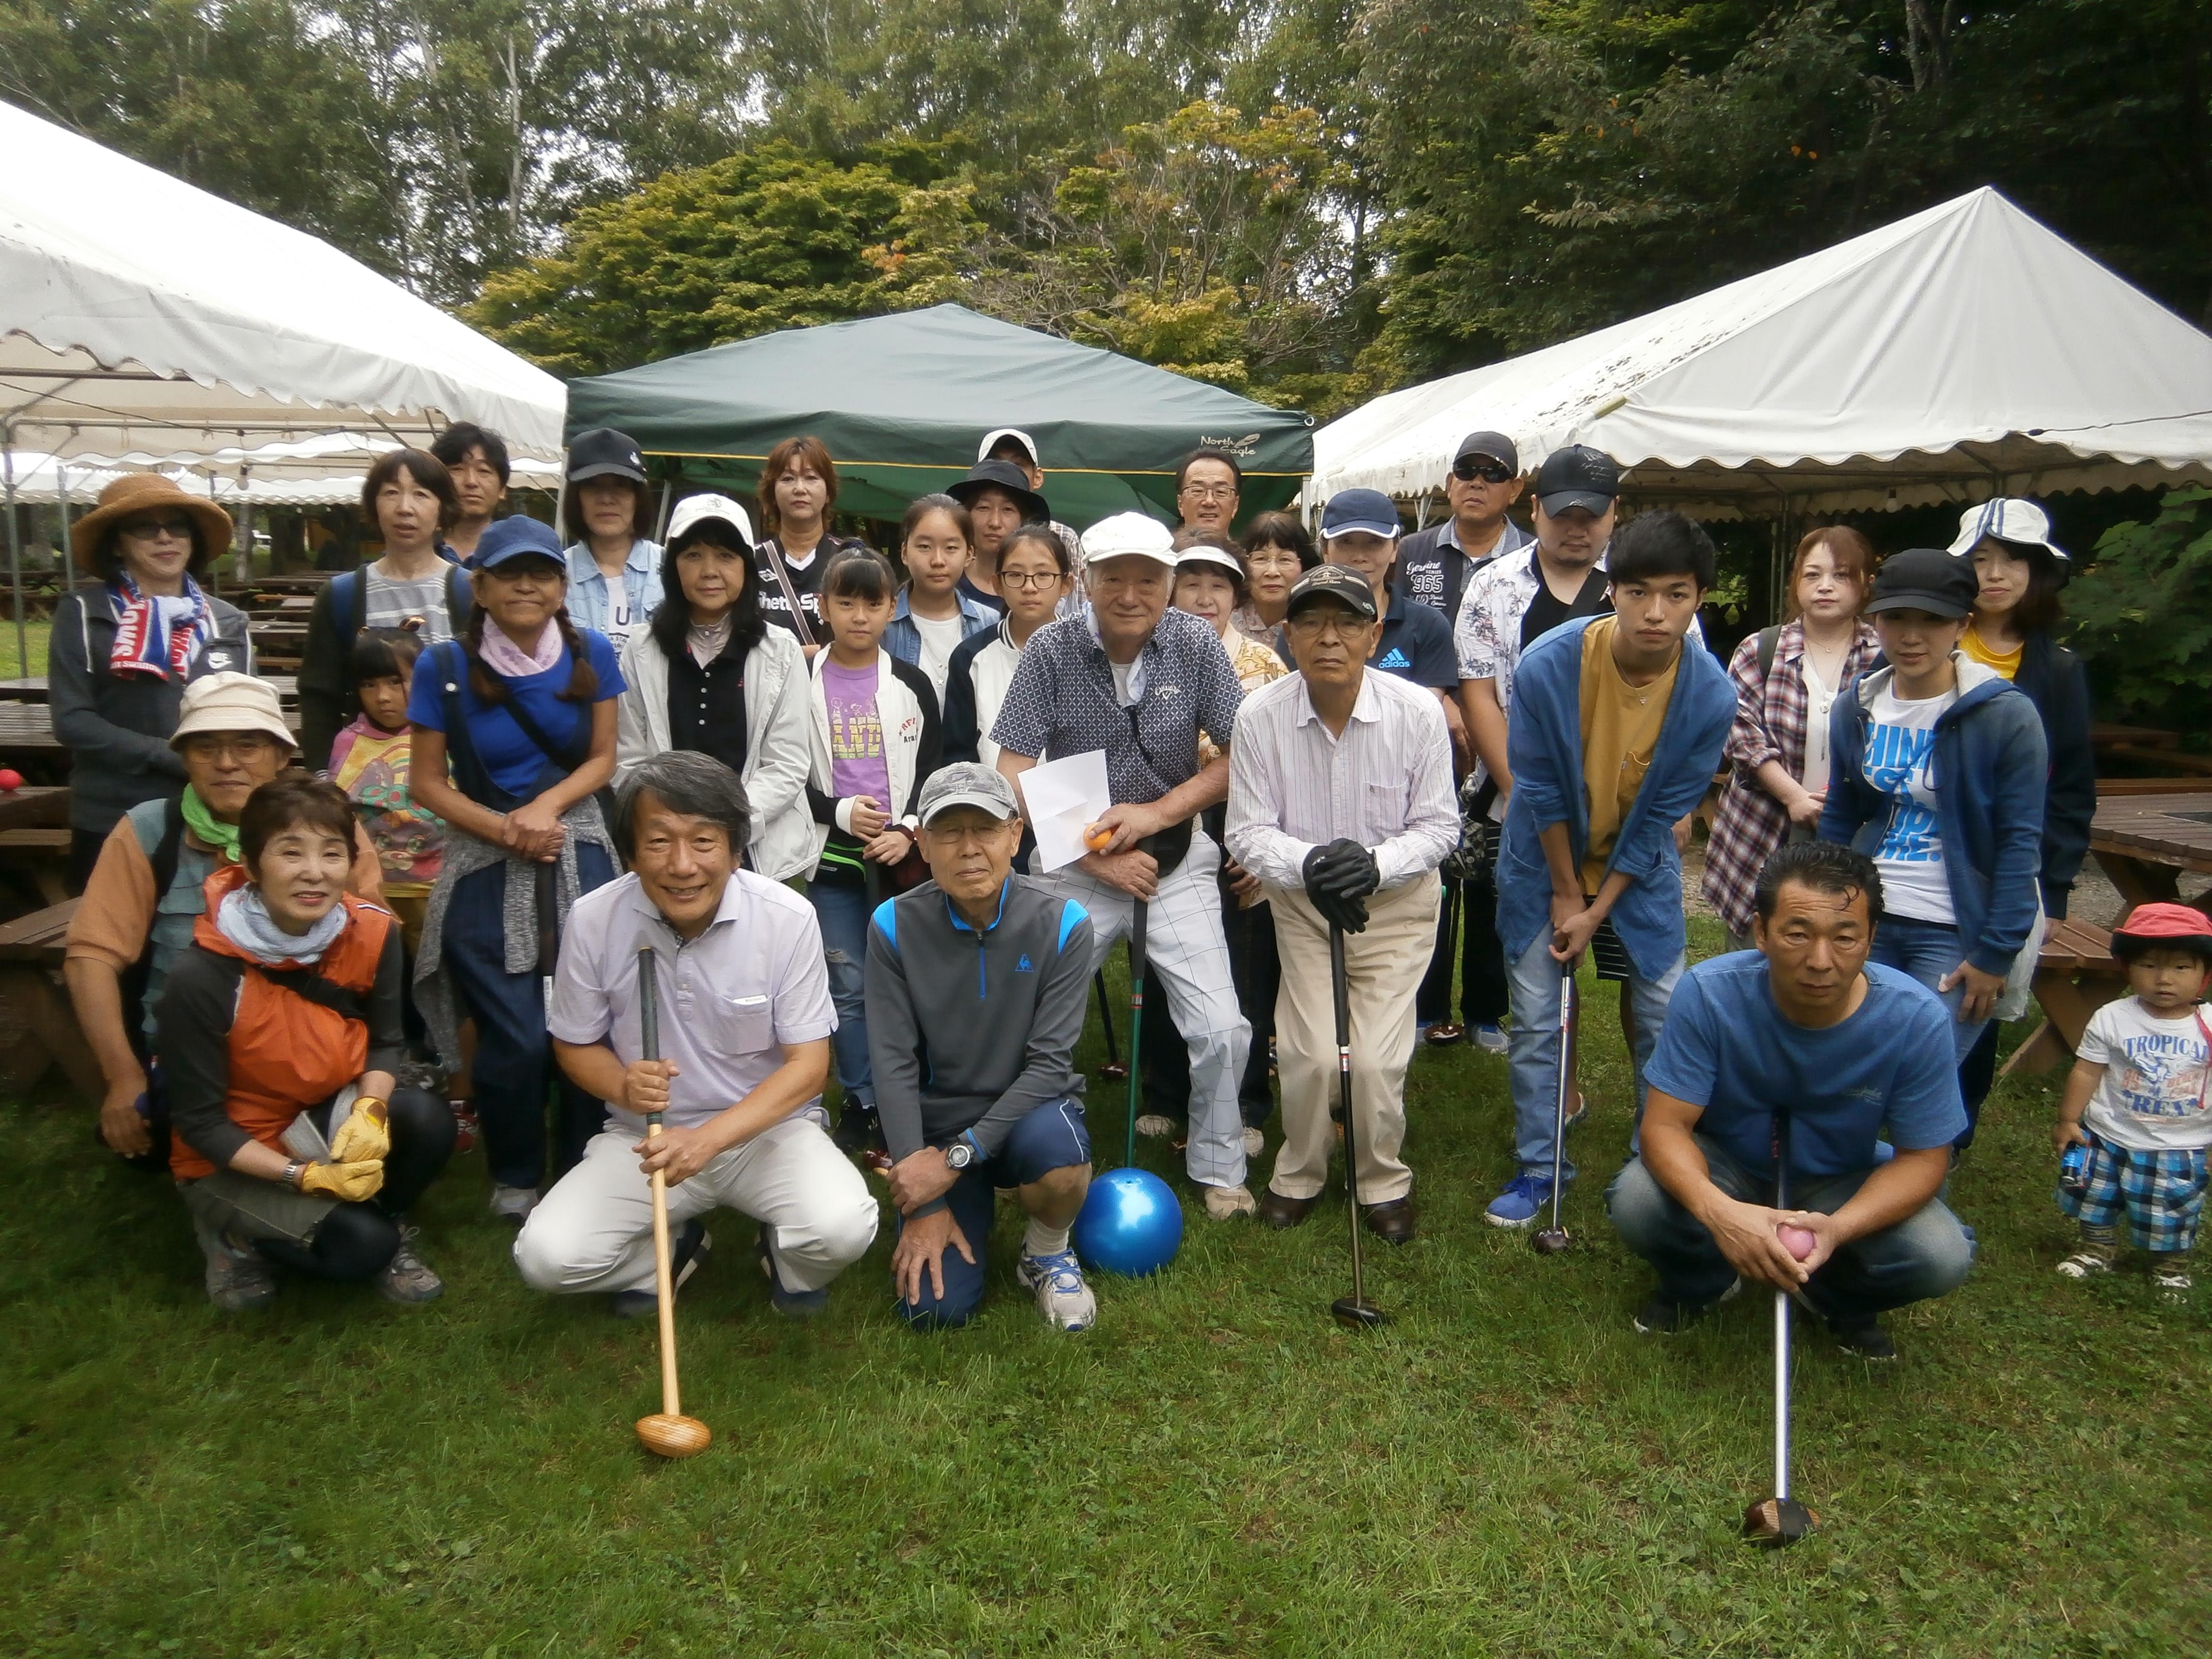 http://www.n2jinhinyouki.com/news/images/P8200035.JPG